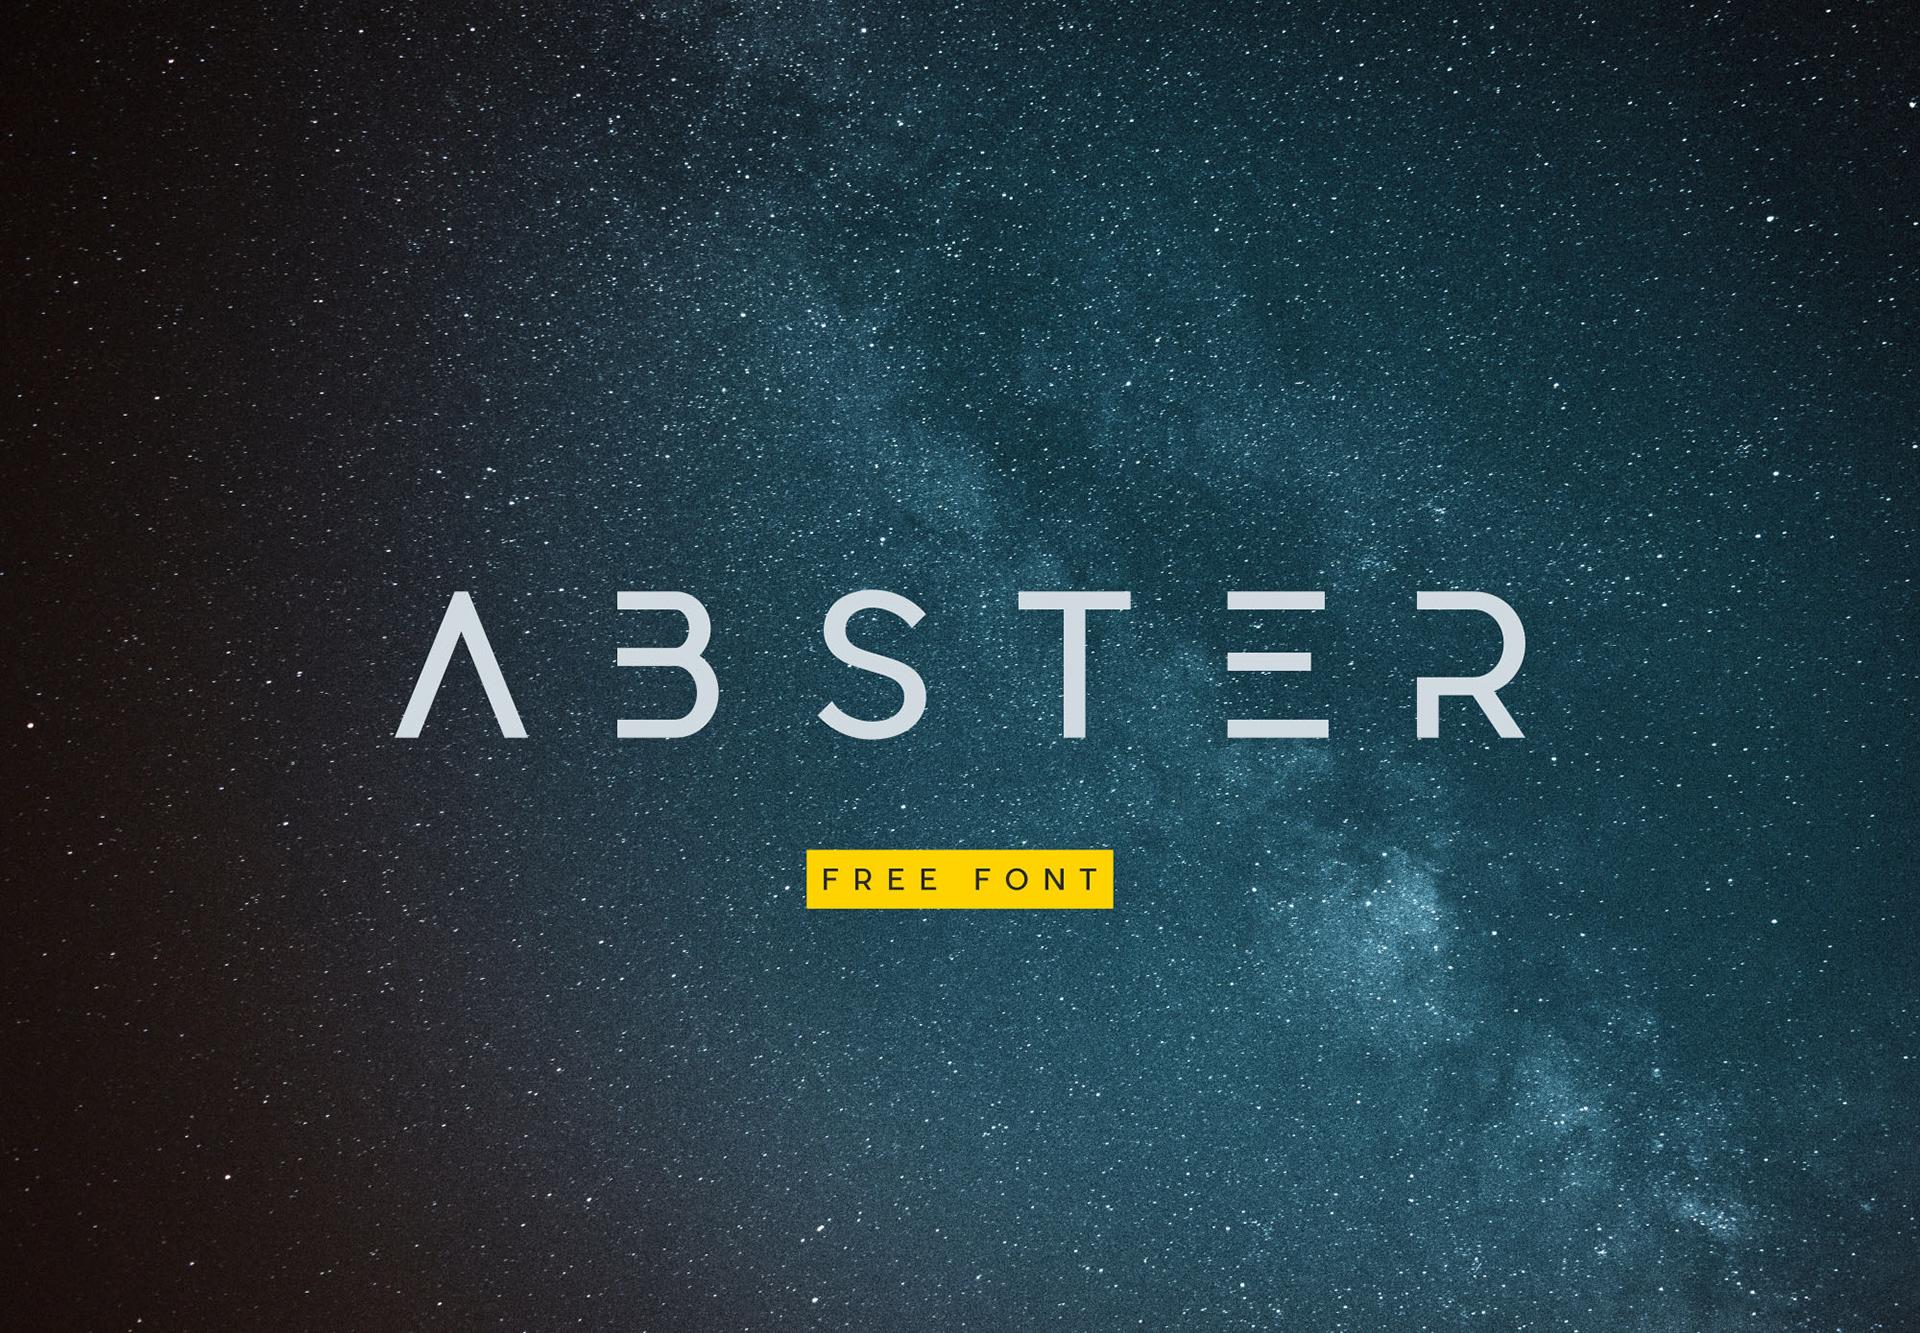 Abster Free Typeface - sans-serif